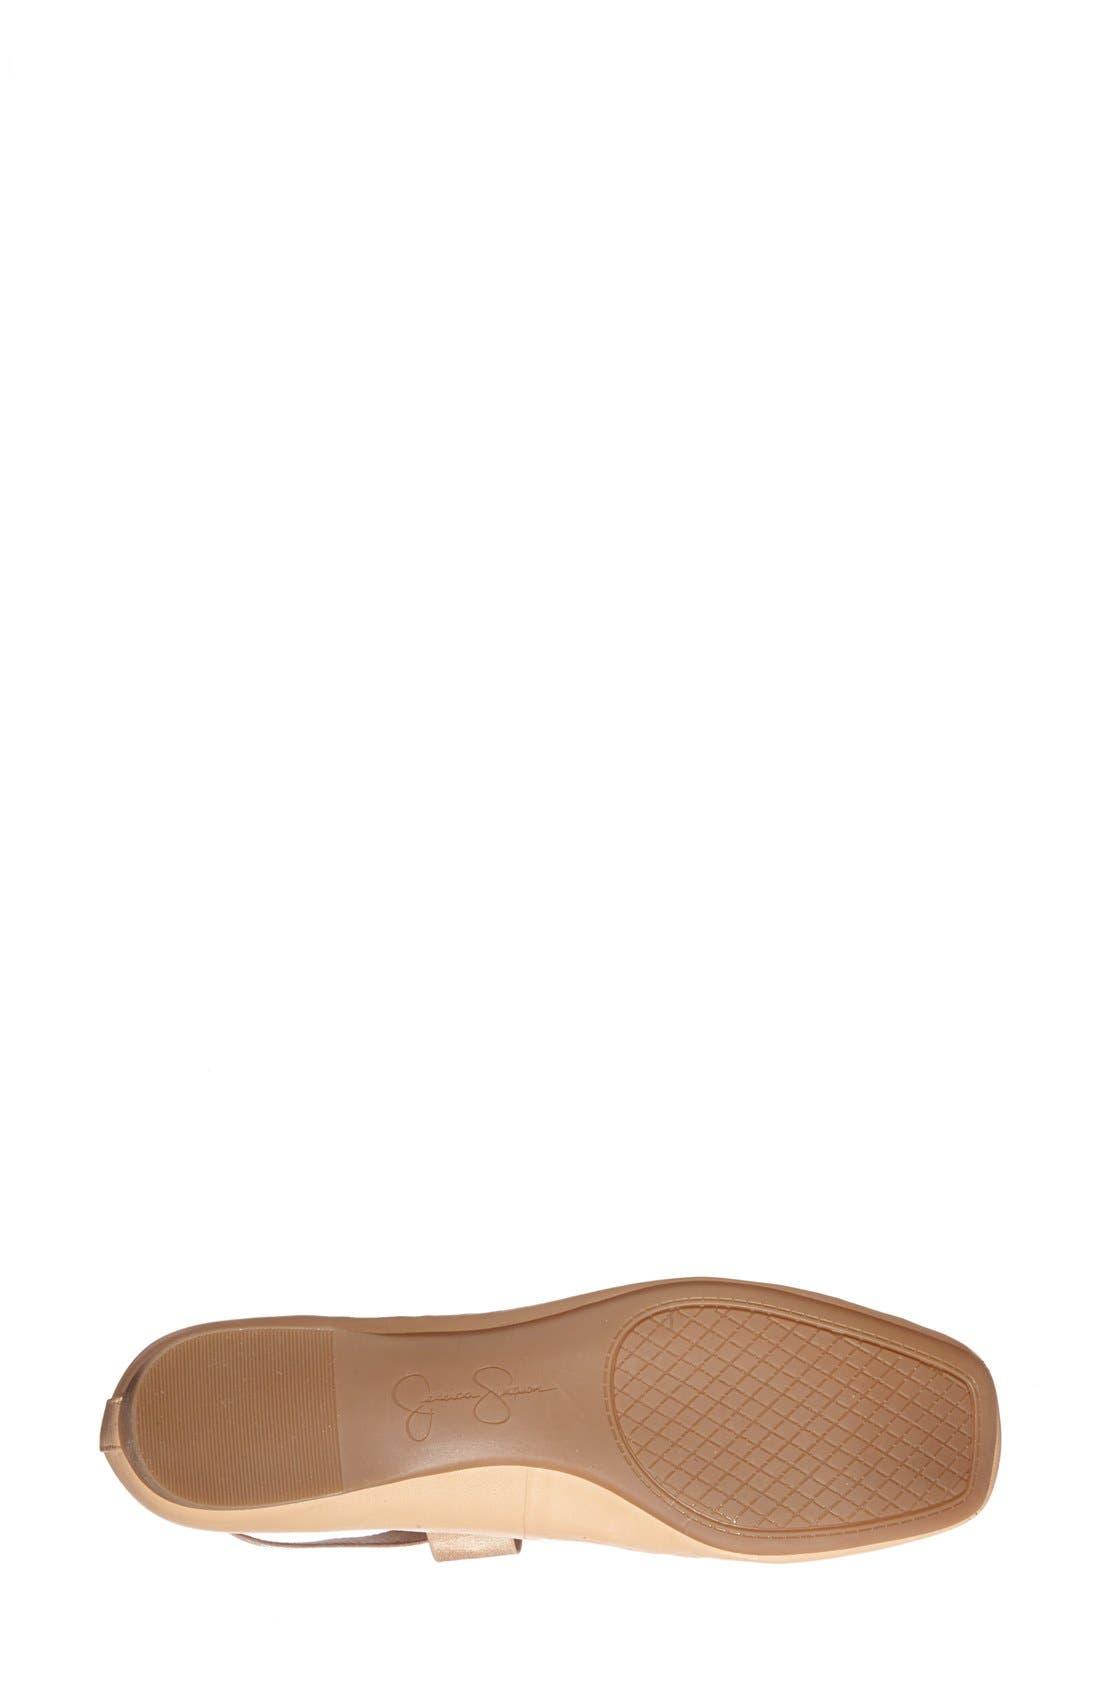 Alternate Image 4  - Jessica Simpson 'Mandalaye' Leather Flat